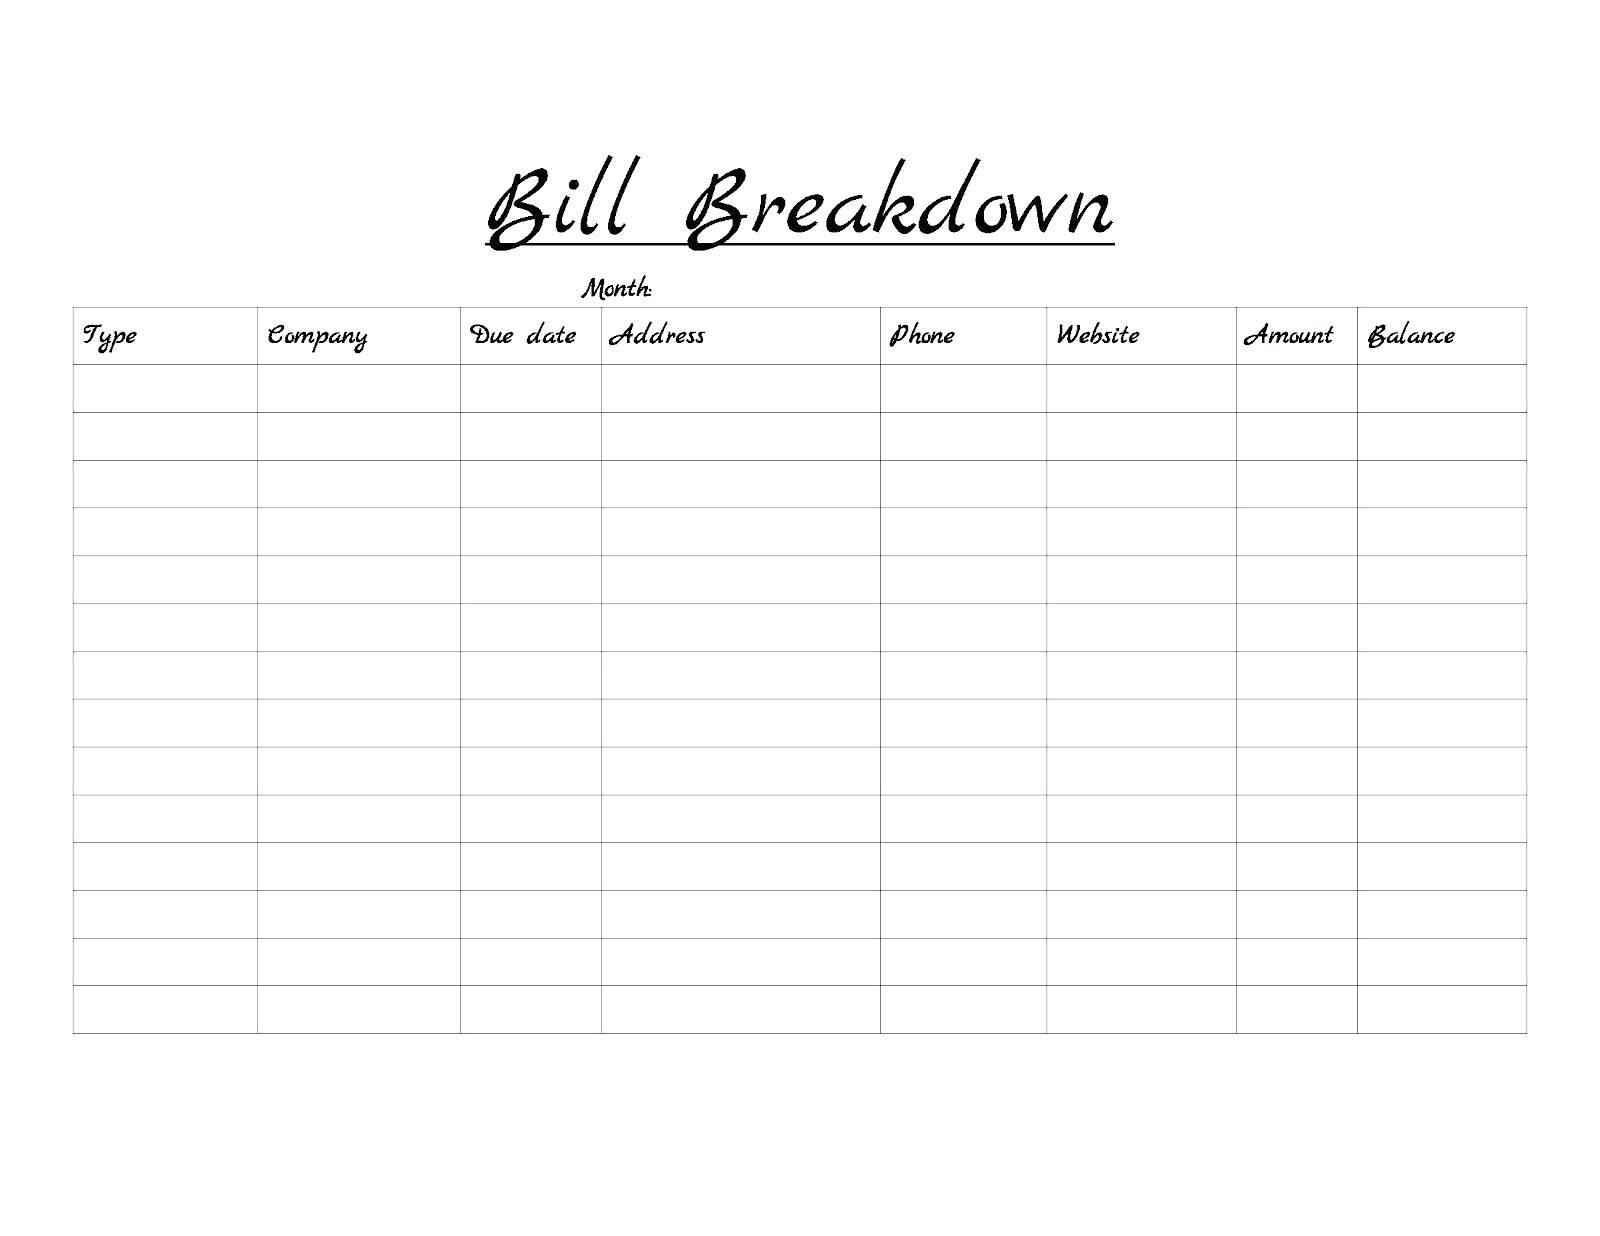 Monthly Bills Template Free - Monte-Monthly Bills Due List Printable